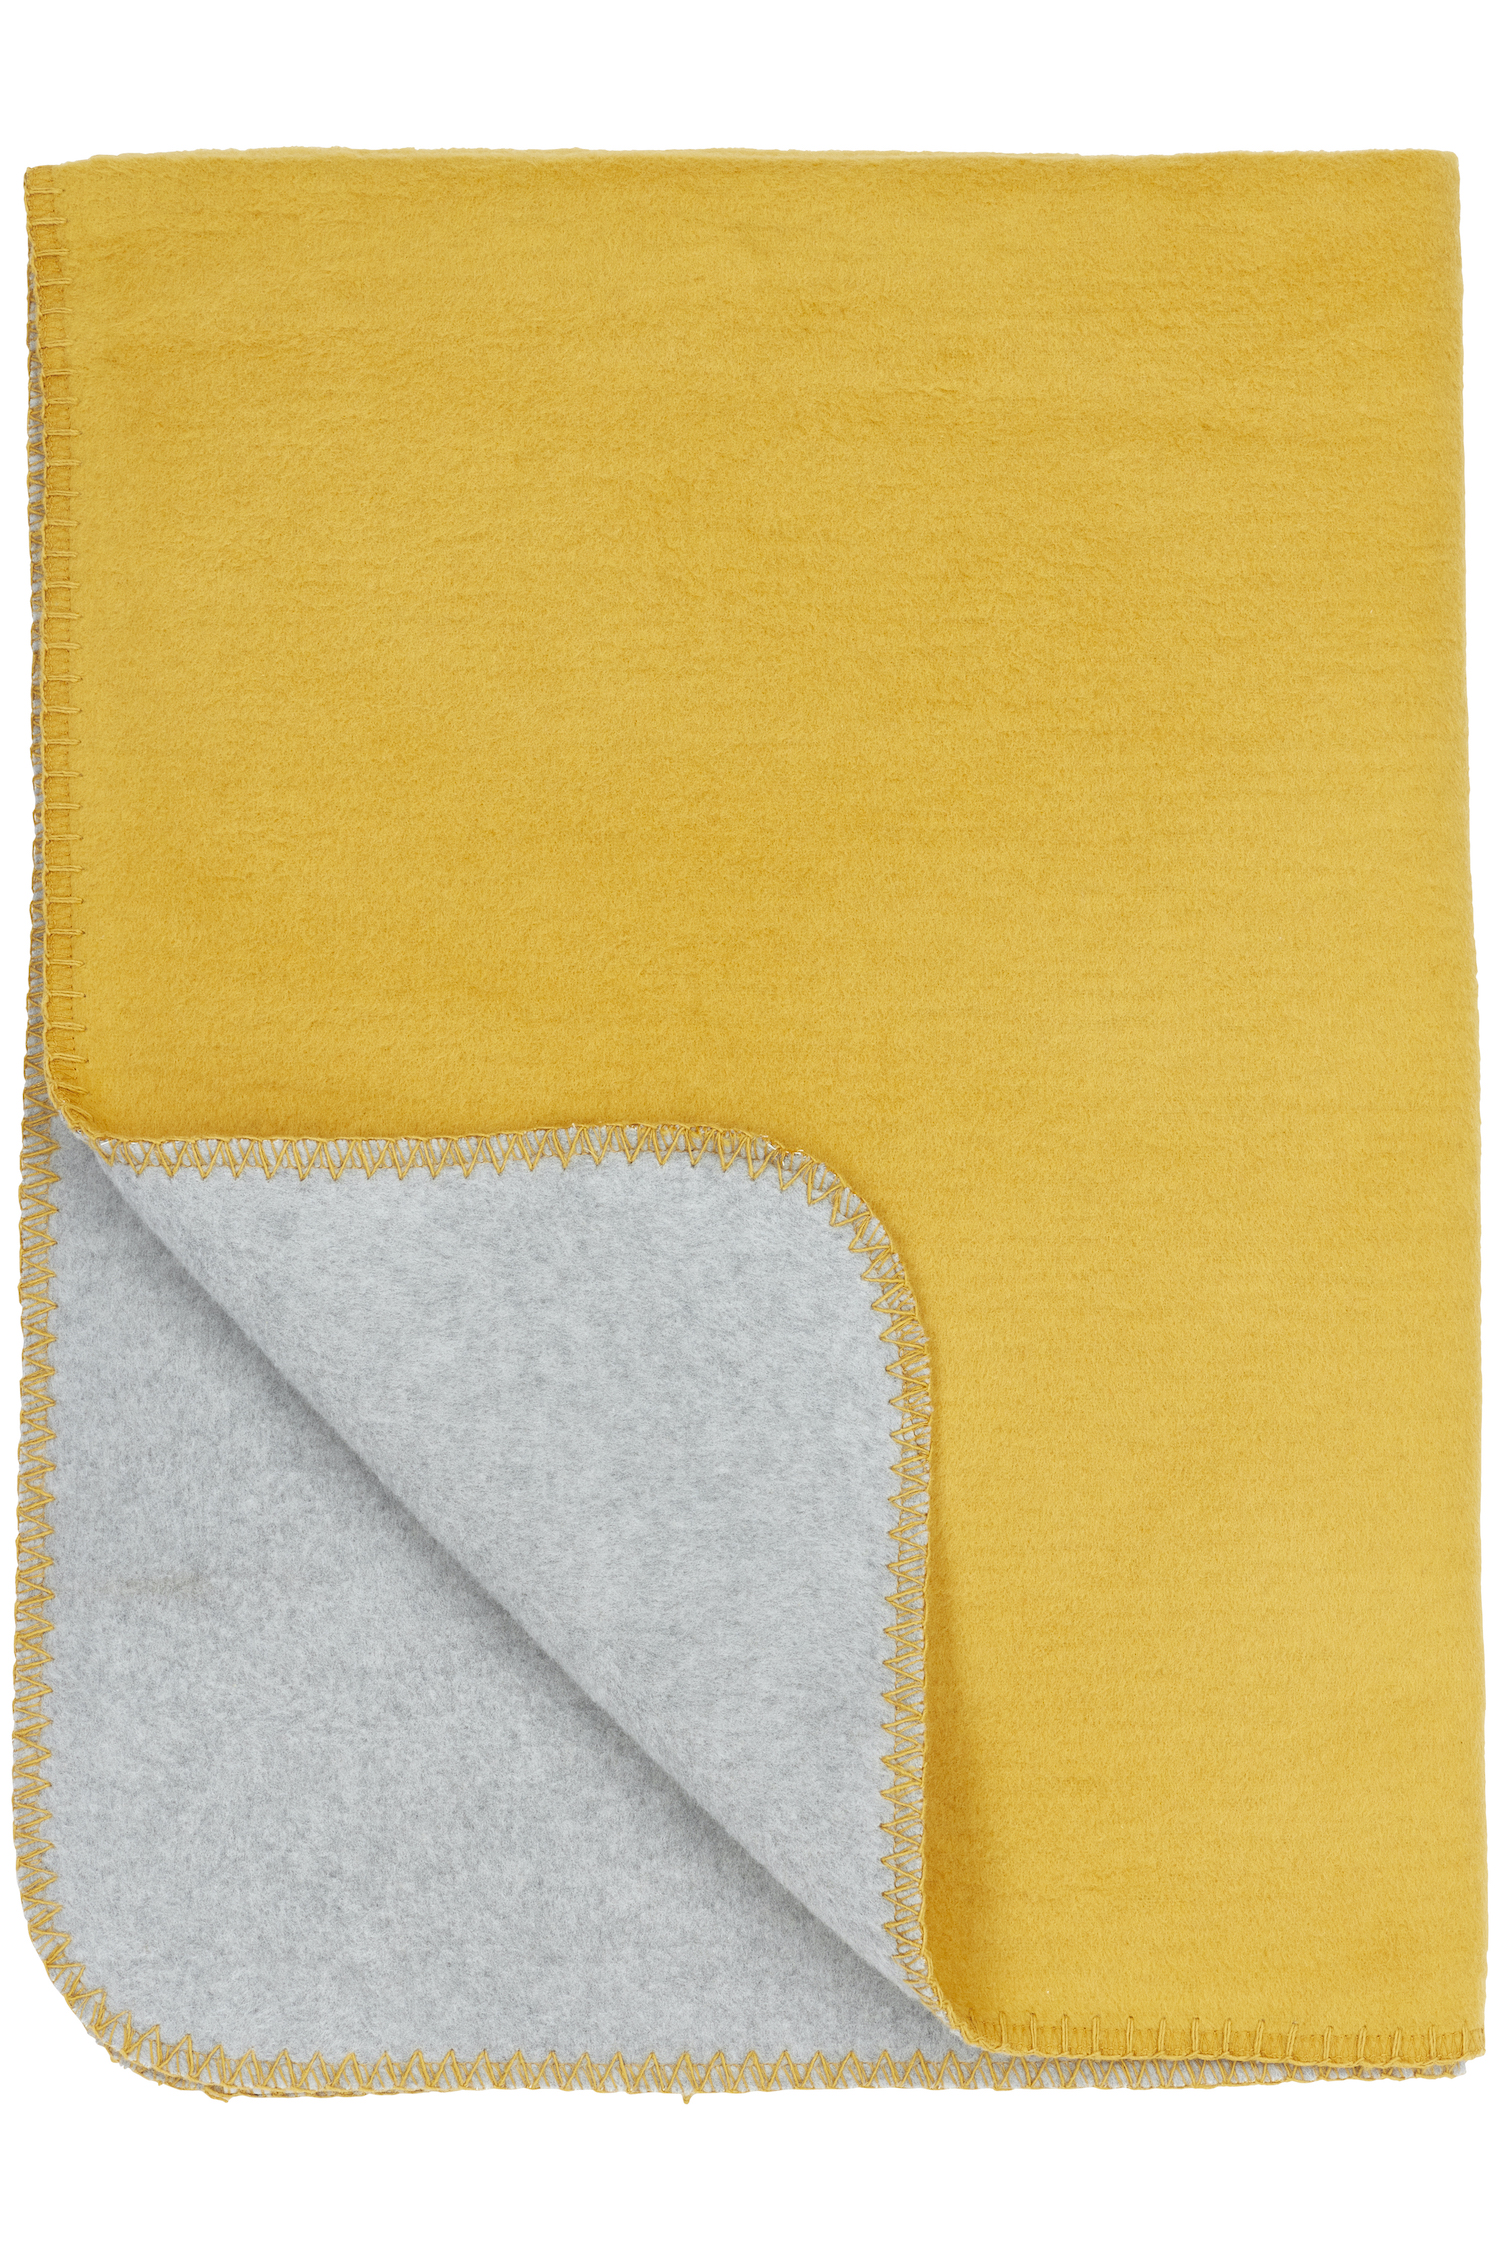 Babydecke klein Zweifarbig - Honey Gold/Grau melange - 75x100cm